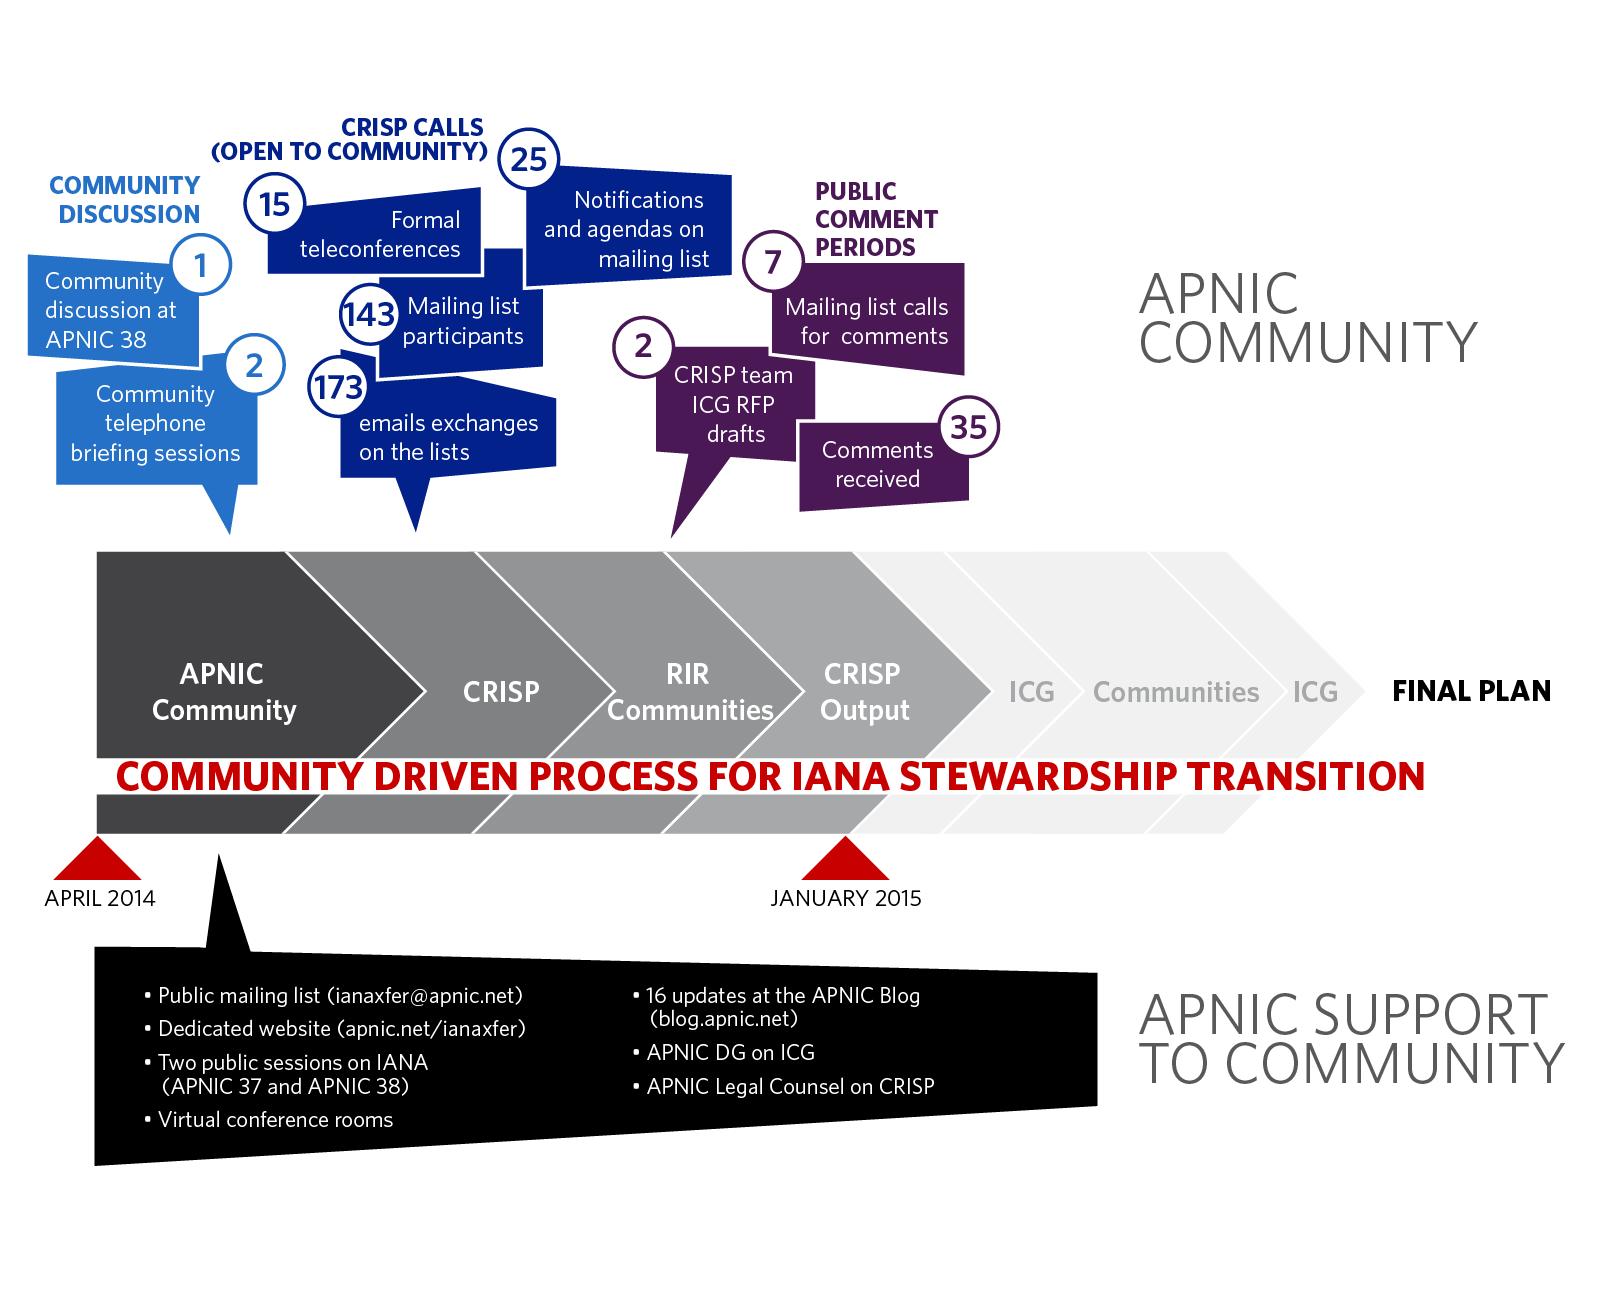 Click to enlarge: The IANA Stewardship Transition so far